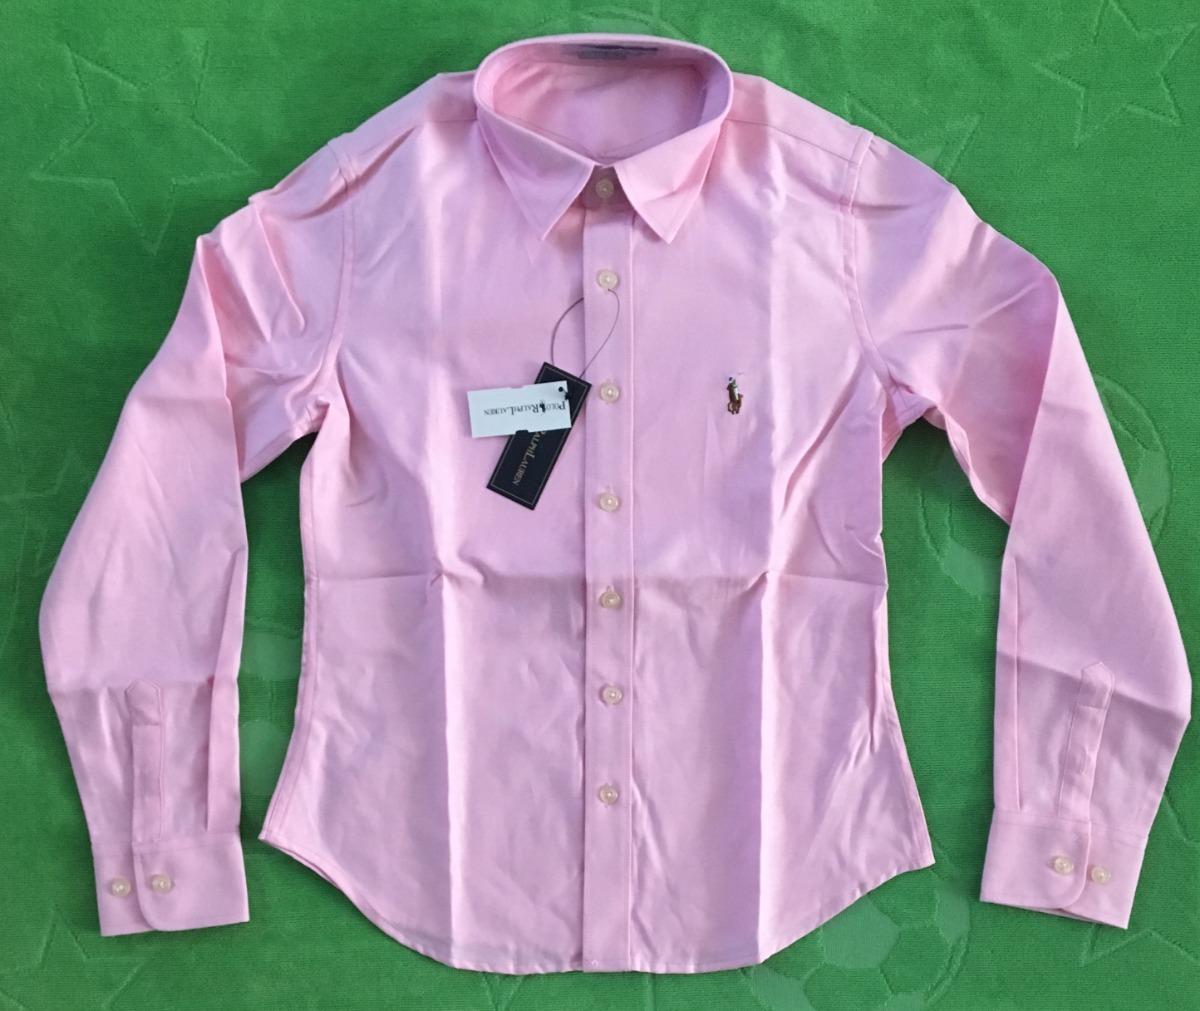 genial camisa blusa mujer dama polo ralph lauren rosa pony. Cargando zoom. fef280731cb